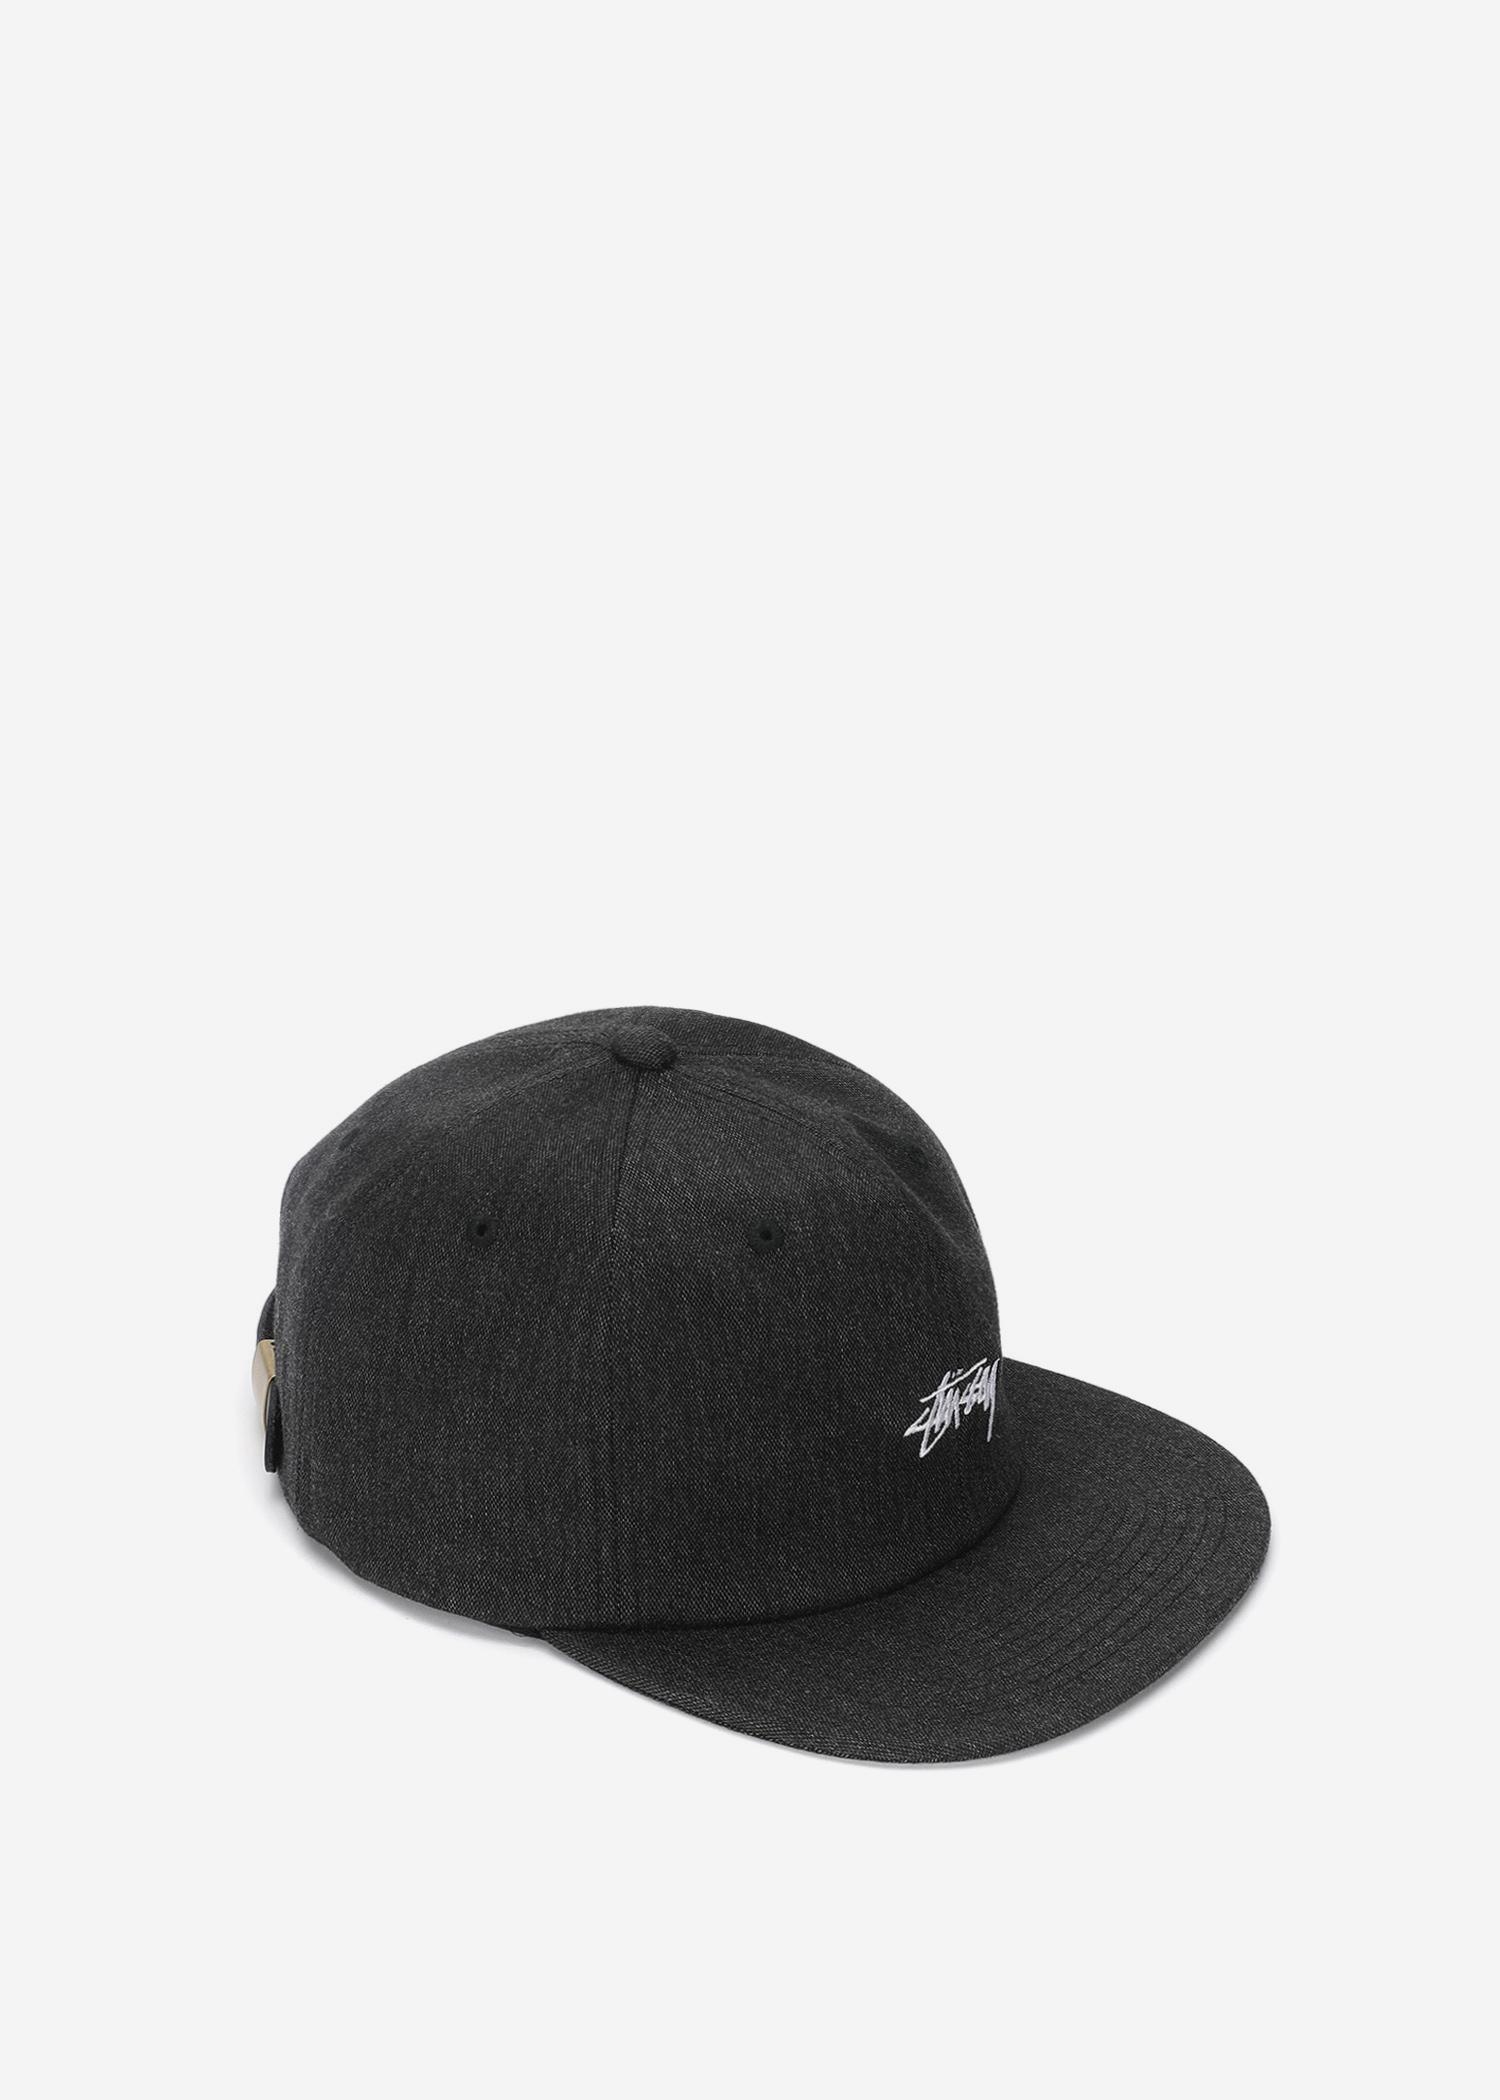 0b4bfbd5a3d Stussy - Black Melange Denim Strapback Cap for Men - Lyst. View fullscreen